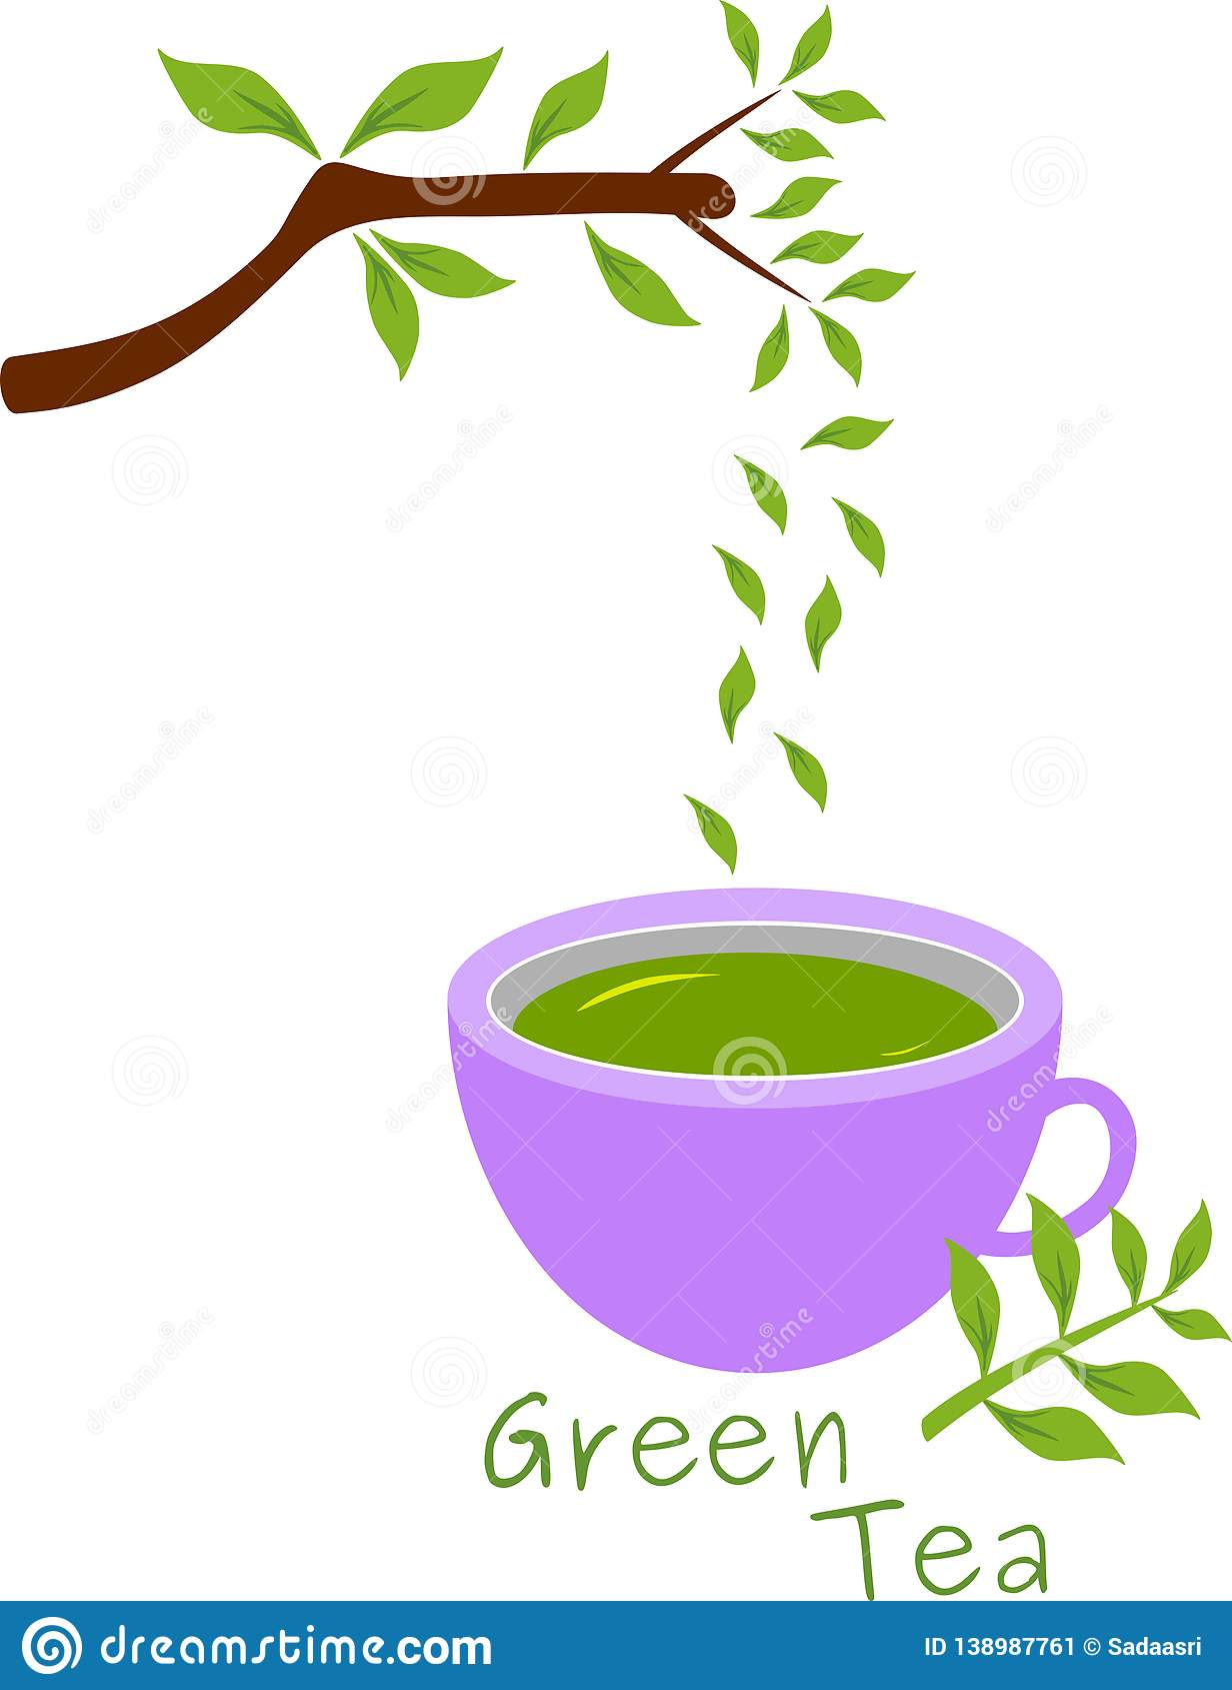 Fresh green tea illustration with leaves